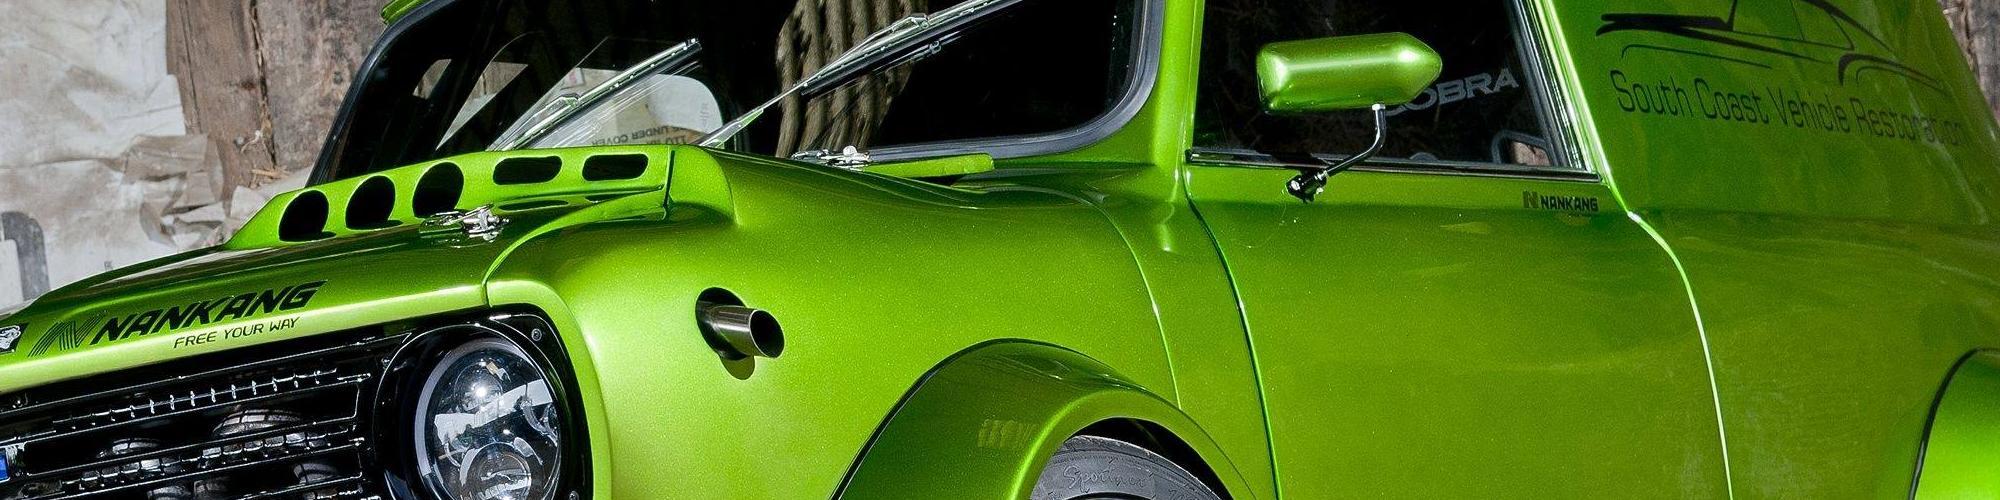 South Coast Vehicle Restorations